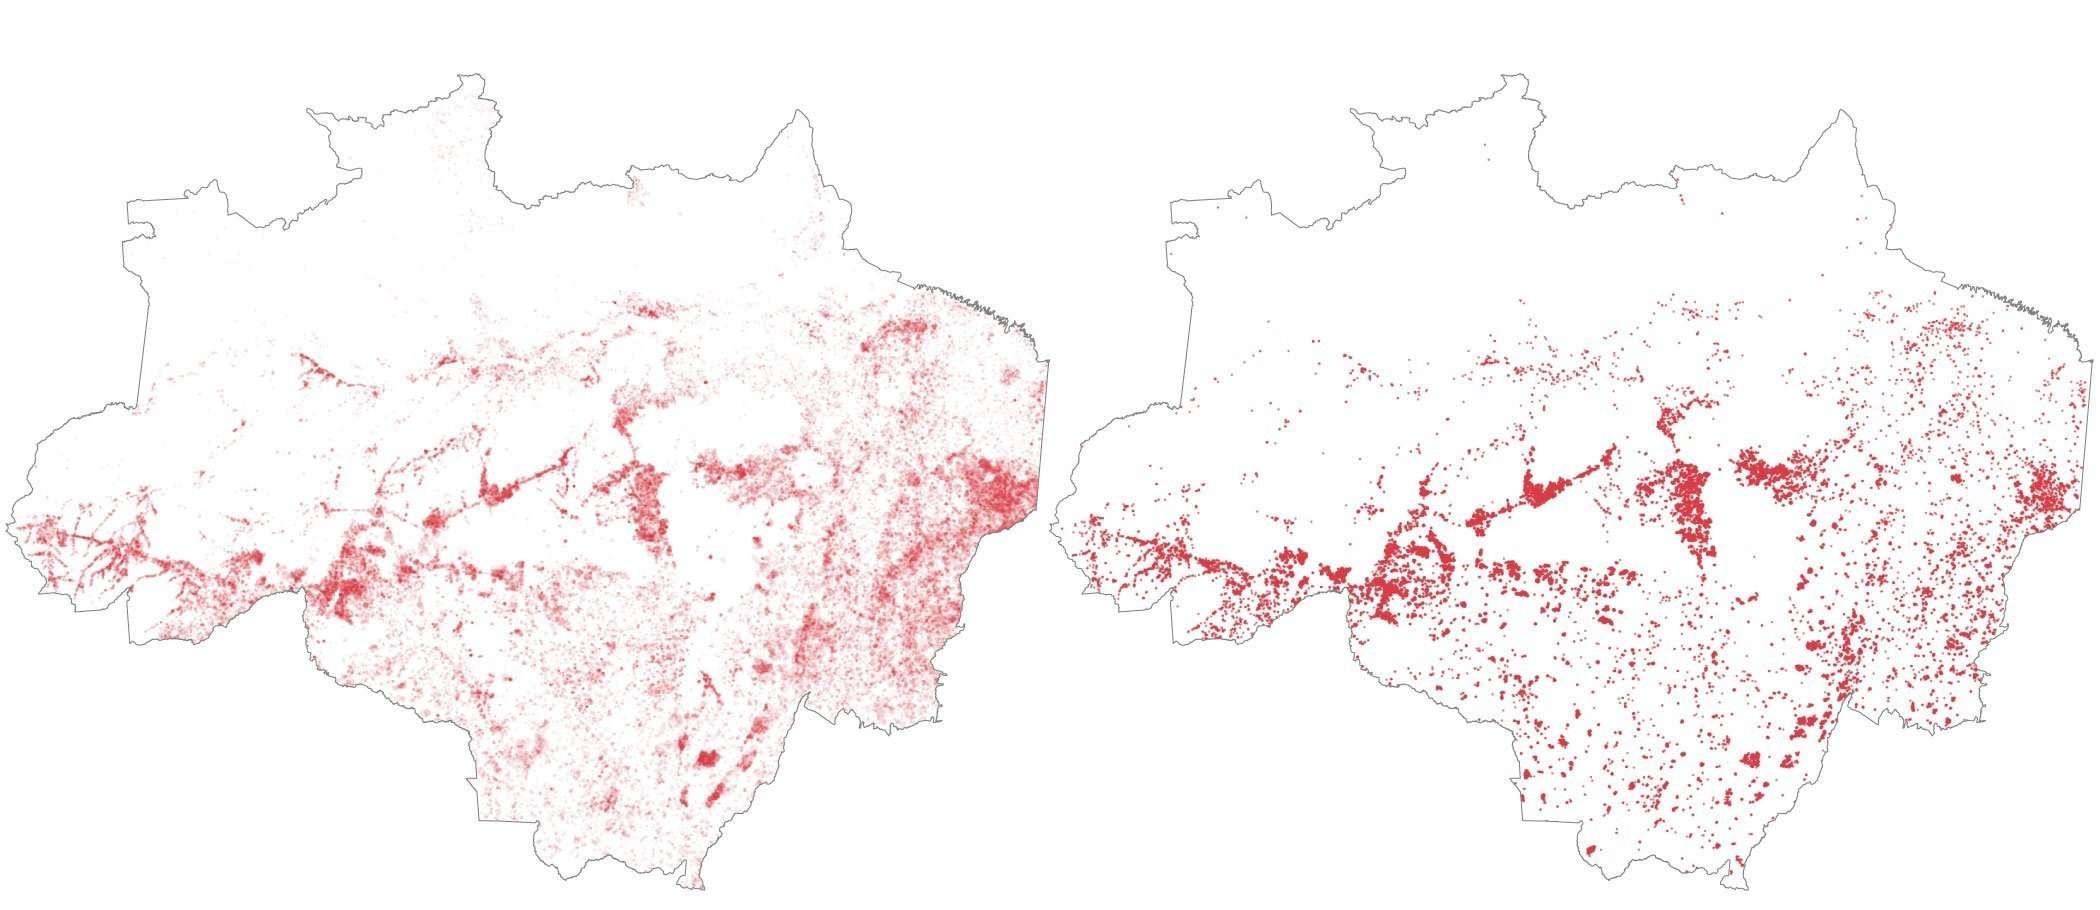 Amazonie Moyenne Août 2011-2018 et Août 2019